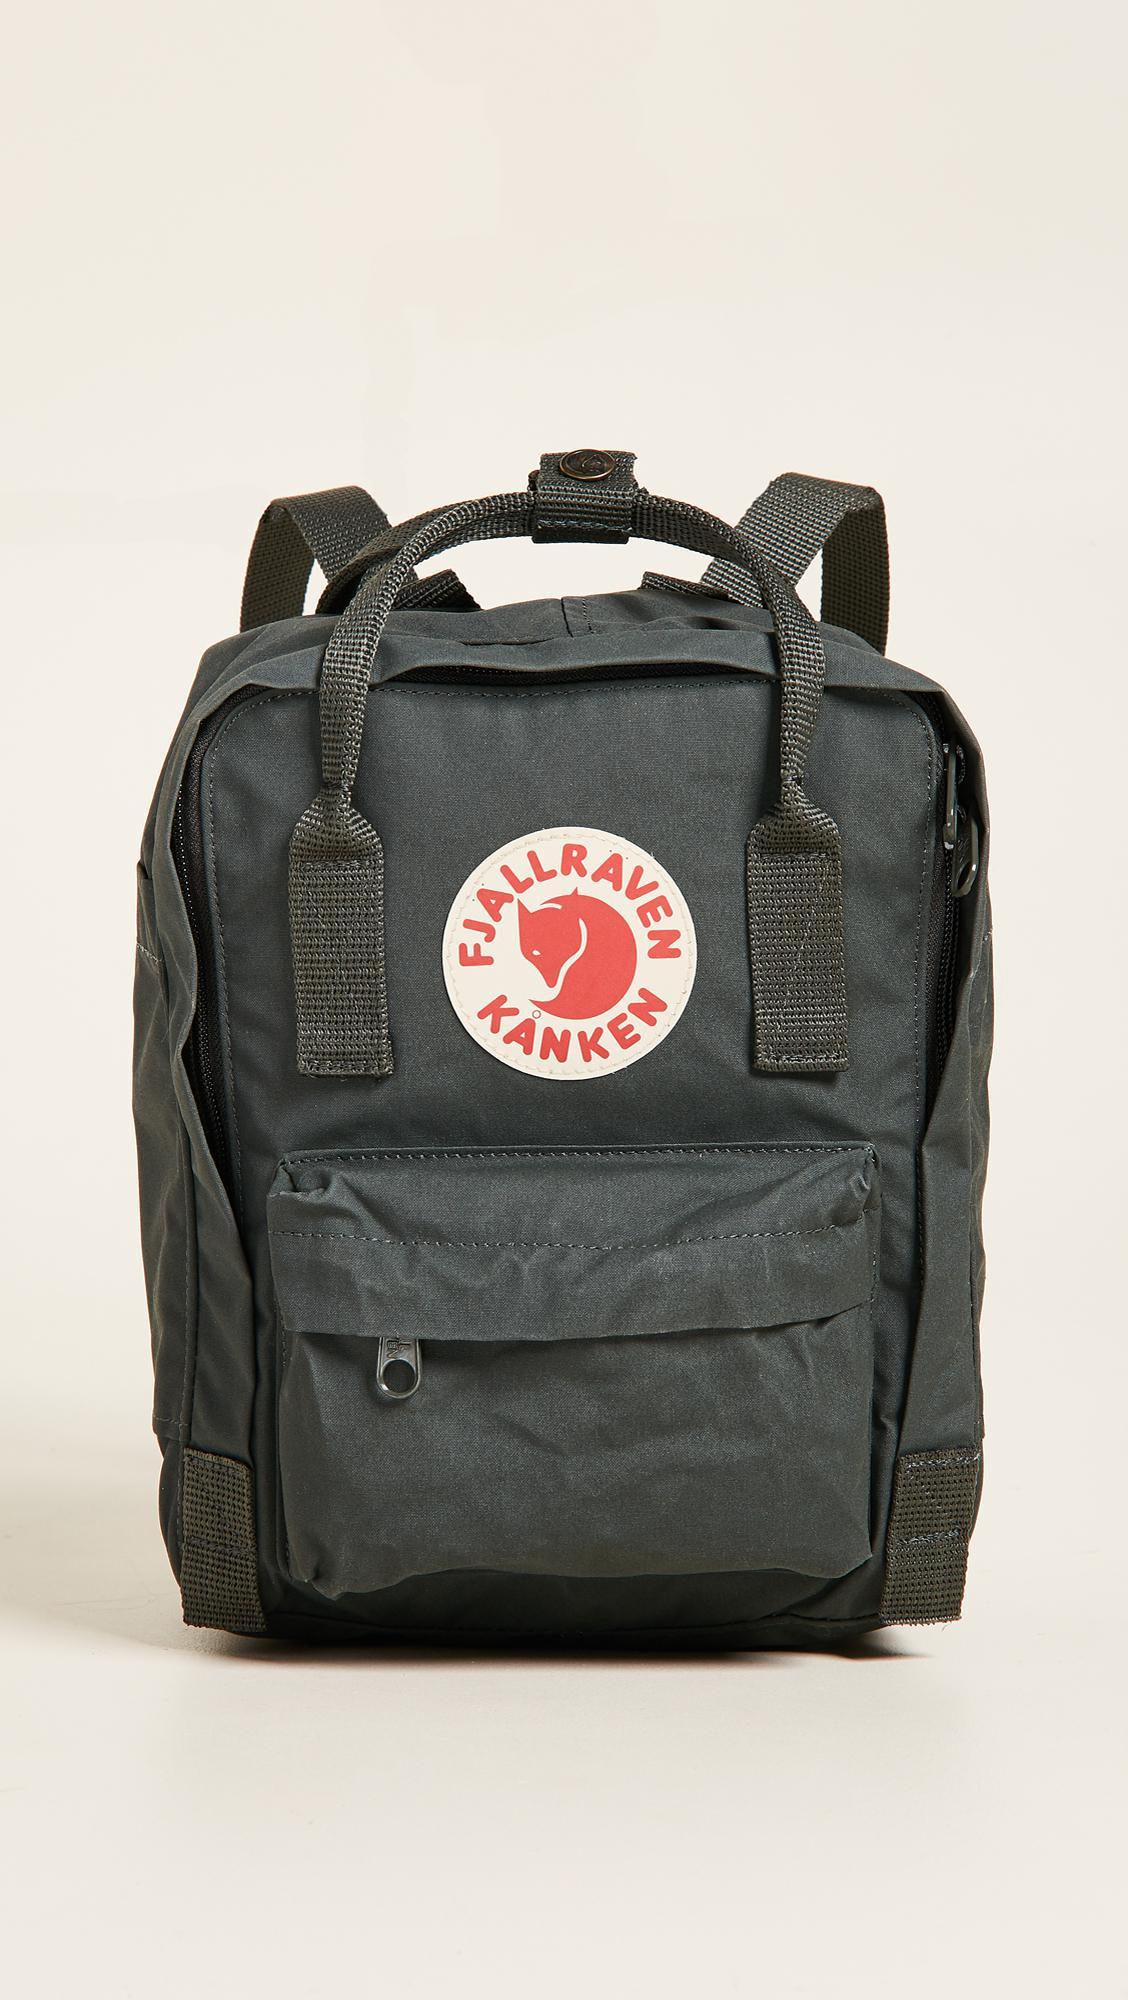 Kanken Mini Backpack Amazon- Fenix Toulouse Handball de2bf33afffc3